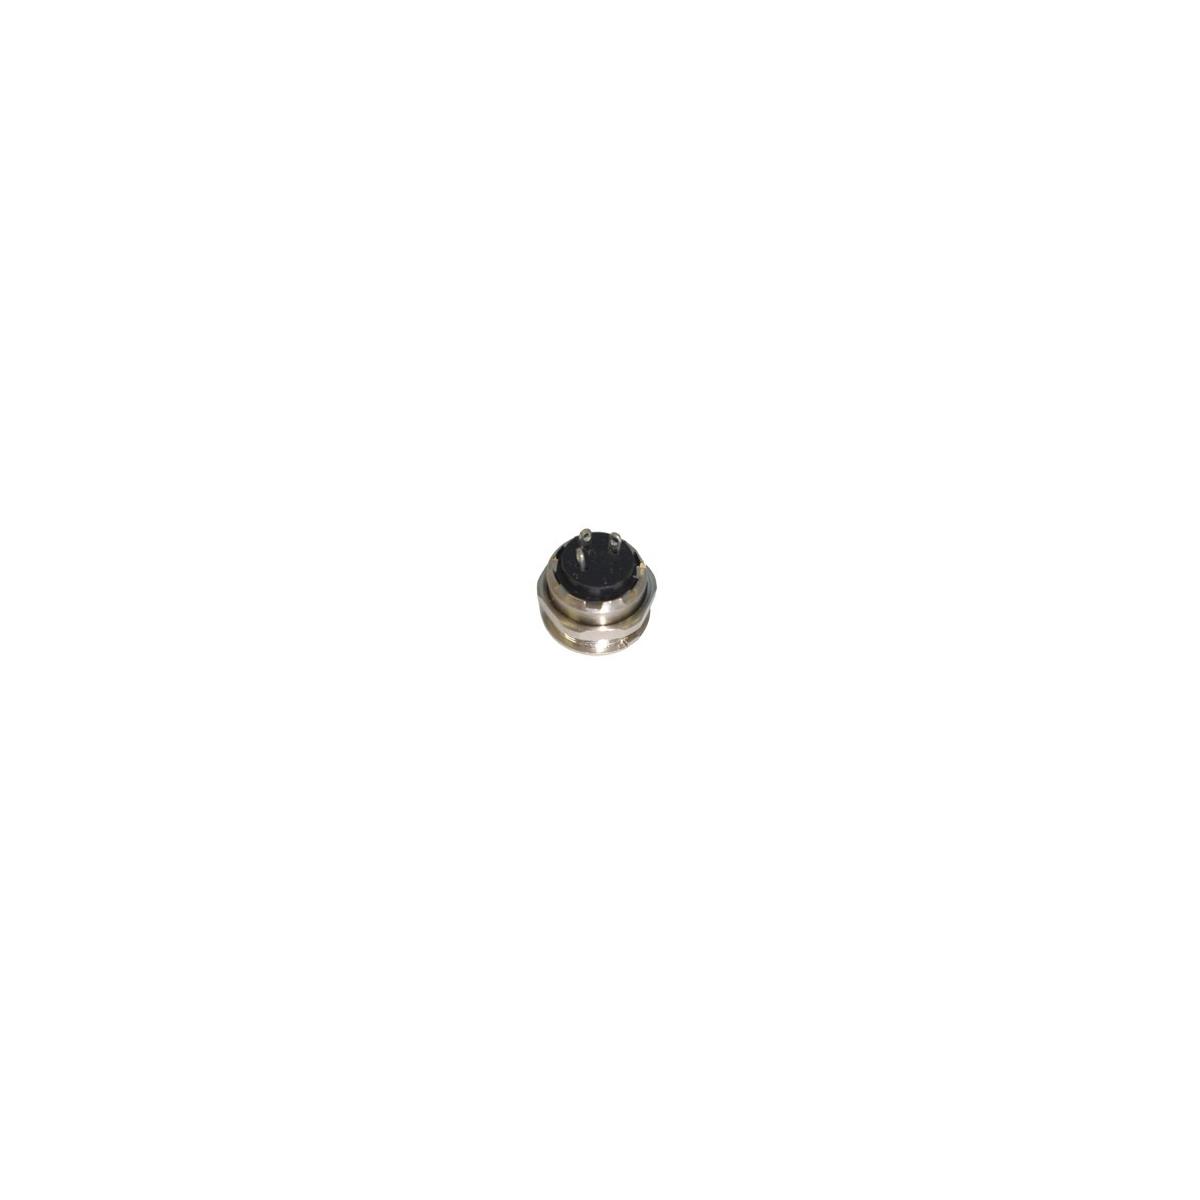 CIRCULAR FEMEA KFV0.B300 - 3 PINOS-